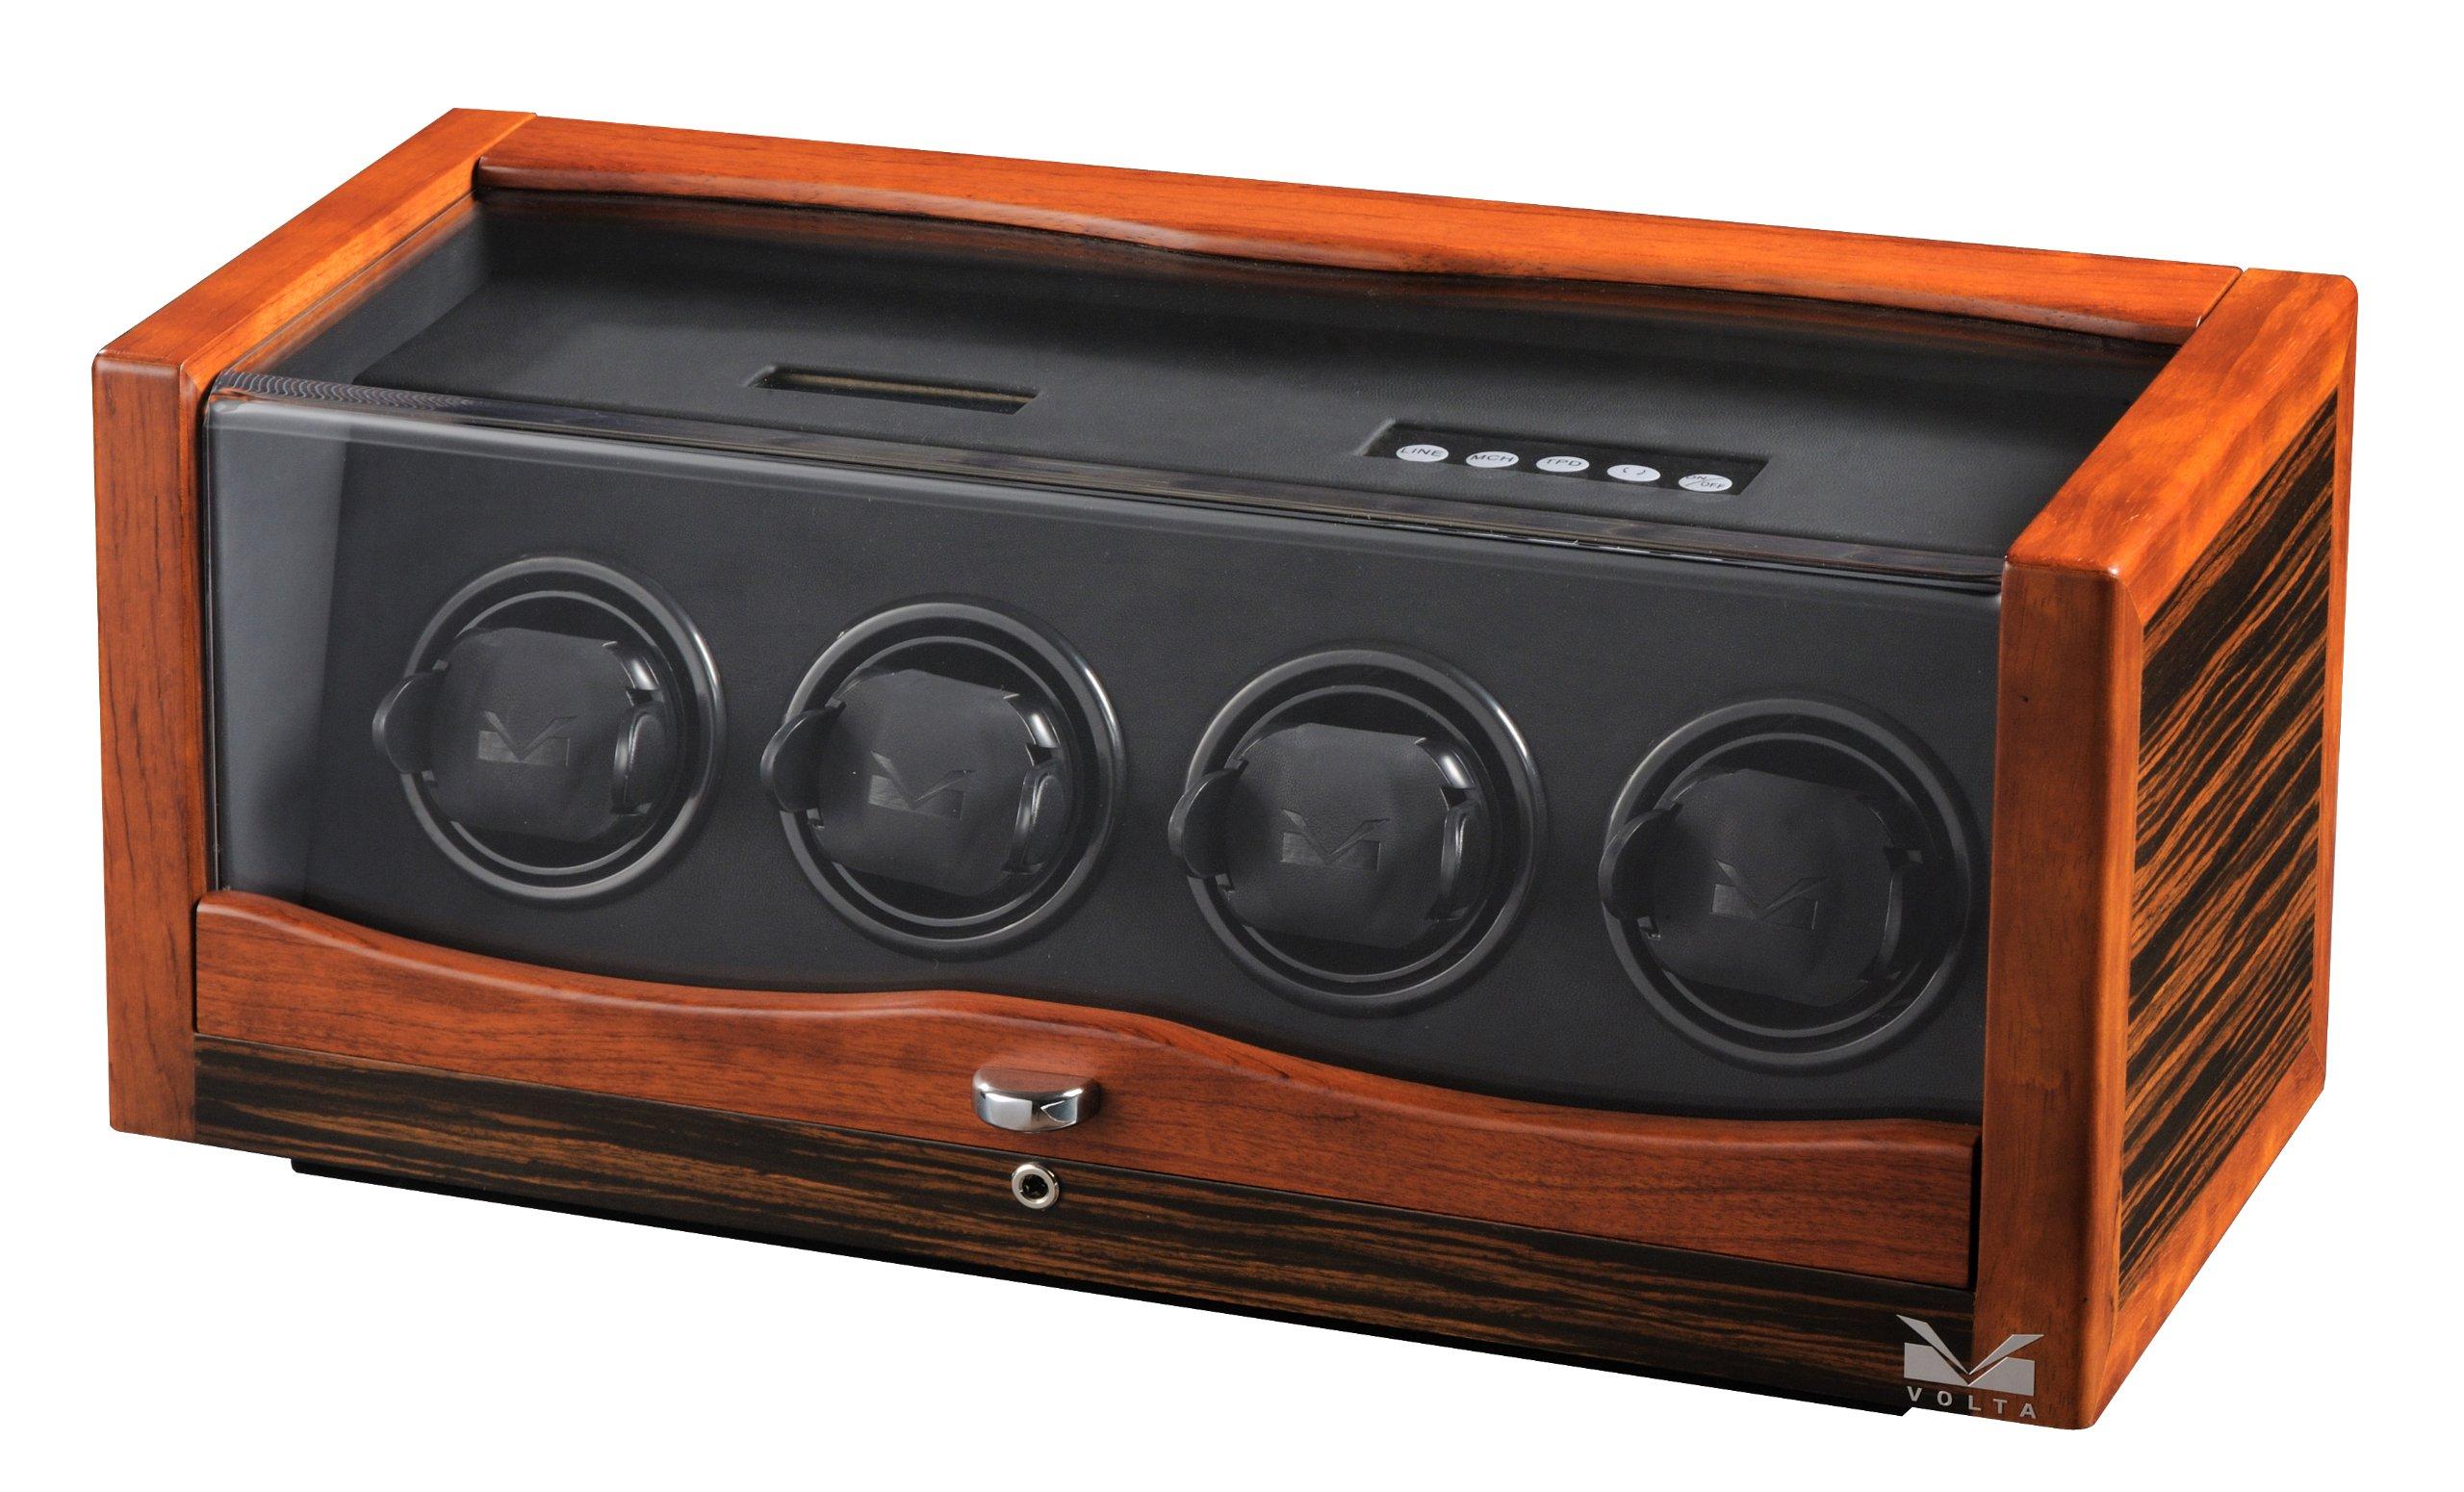 Volta 31-560042 Rustic Rosewood and Ebony Wood Watch Winder